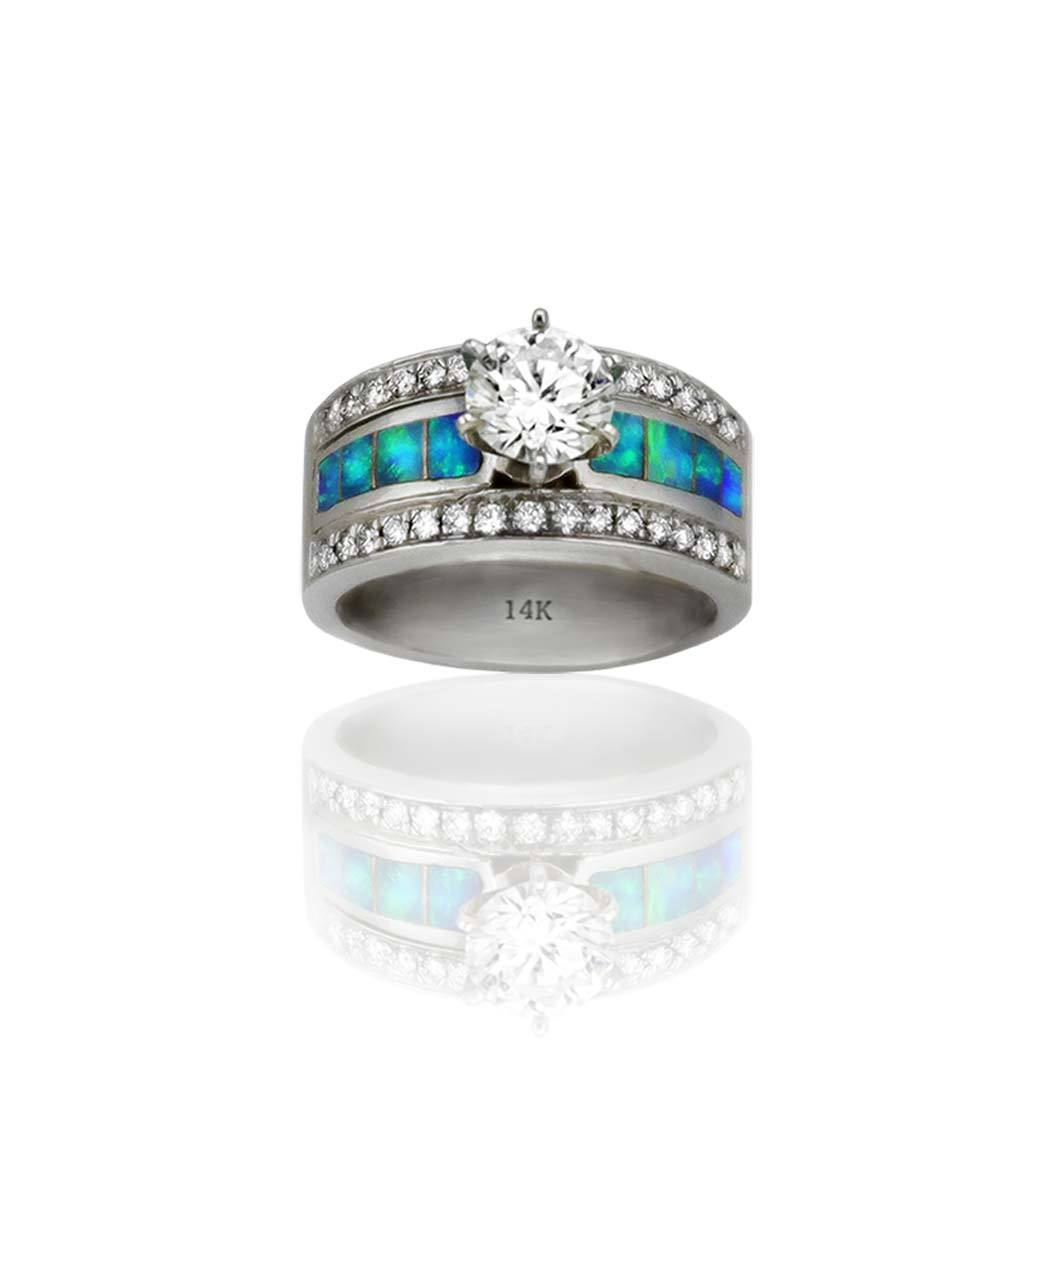 Maverick's 14K White Gold Opal Inlay Band With Round Center Diamond